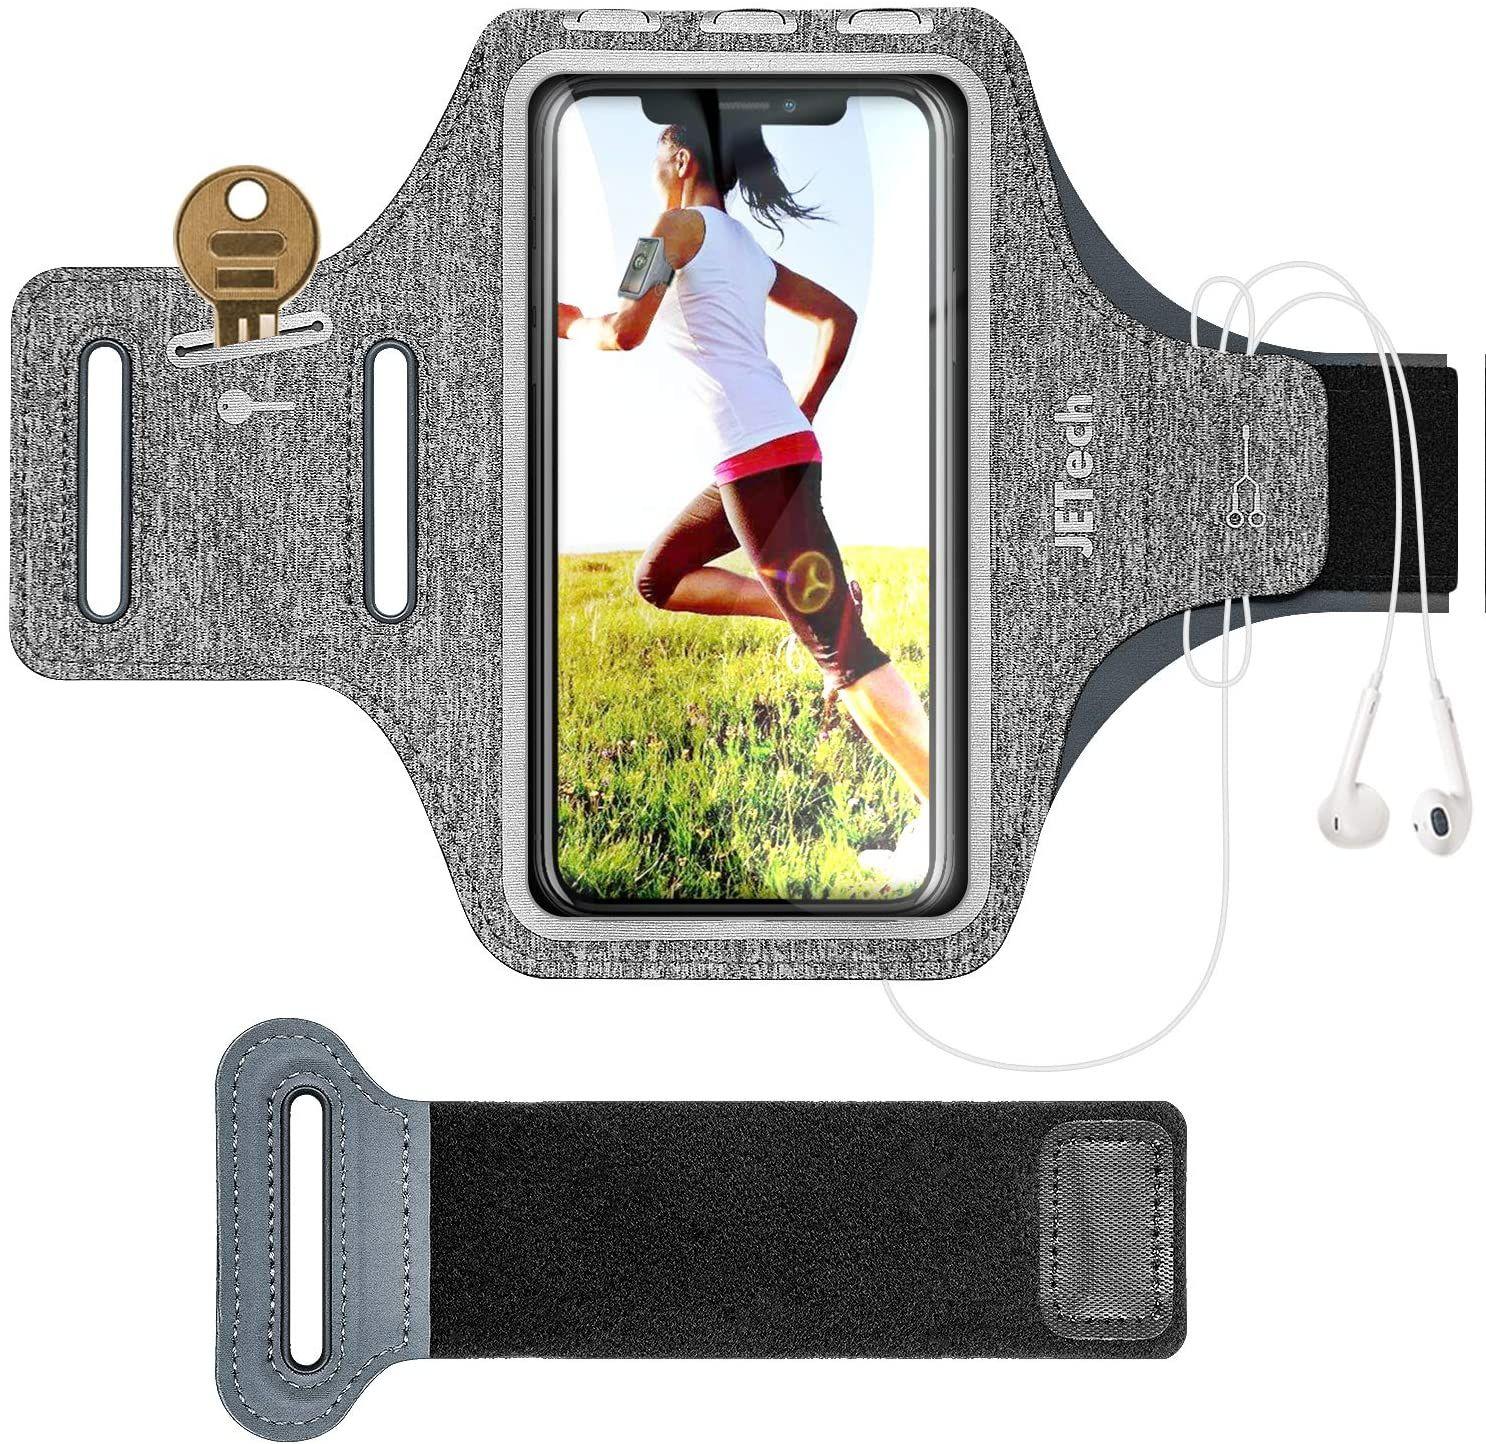 Brassard de sport en 2020 Brassard, Iphone, Iphone 8 plus